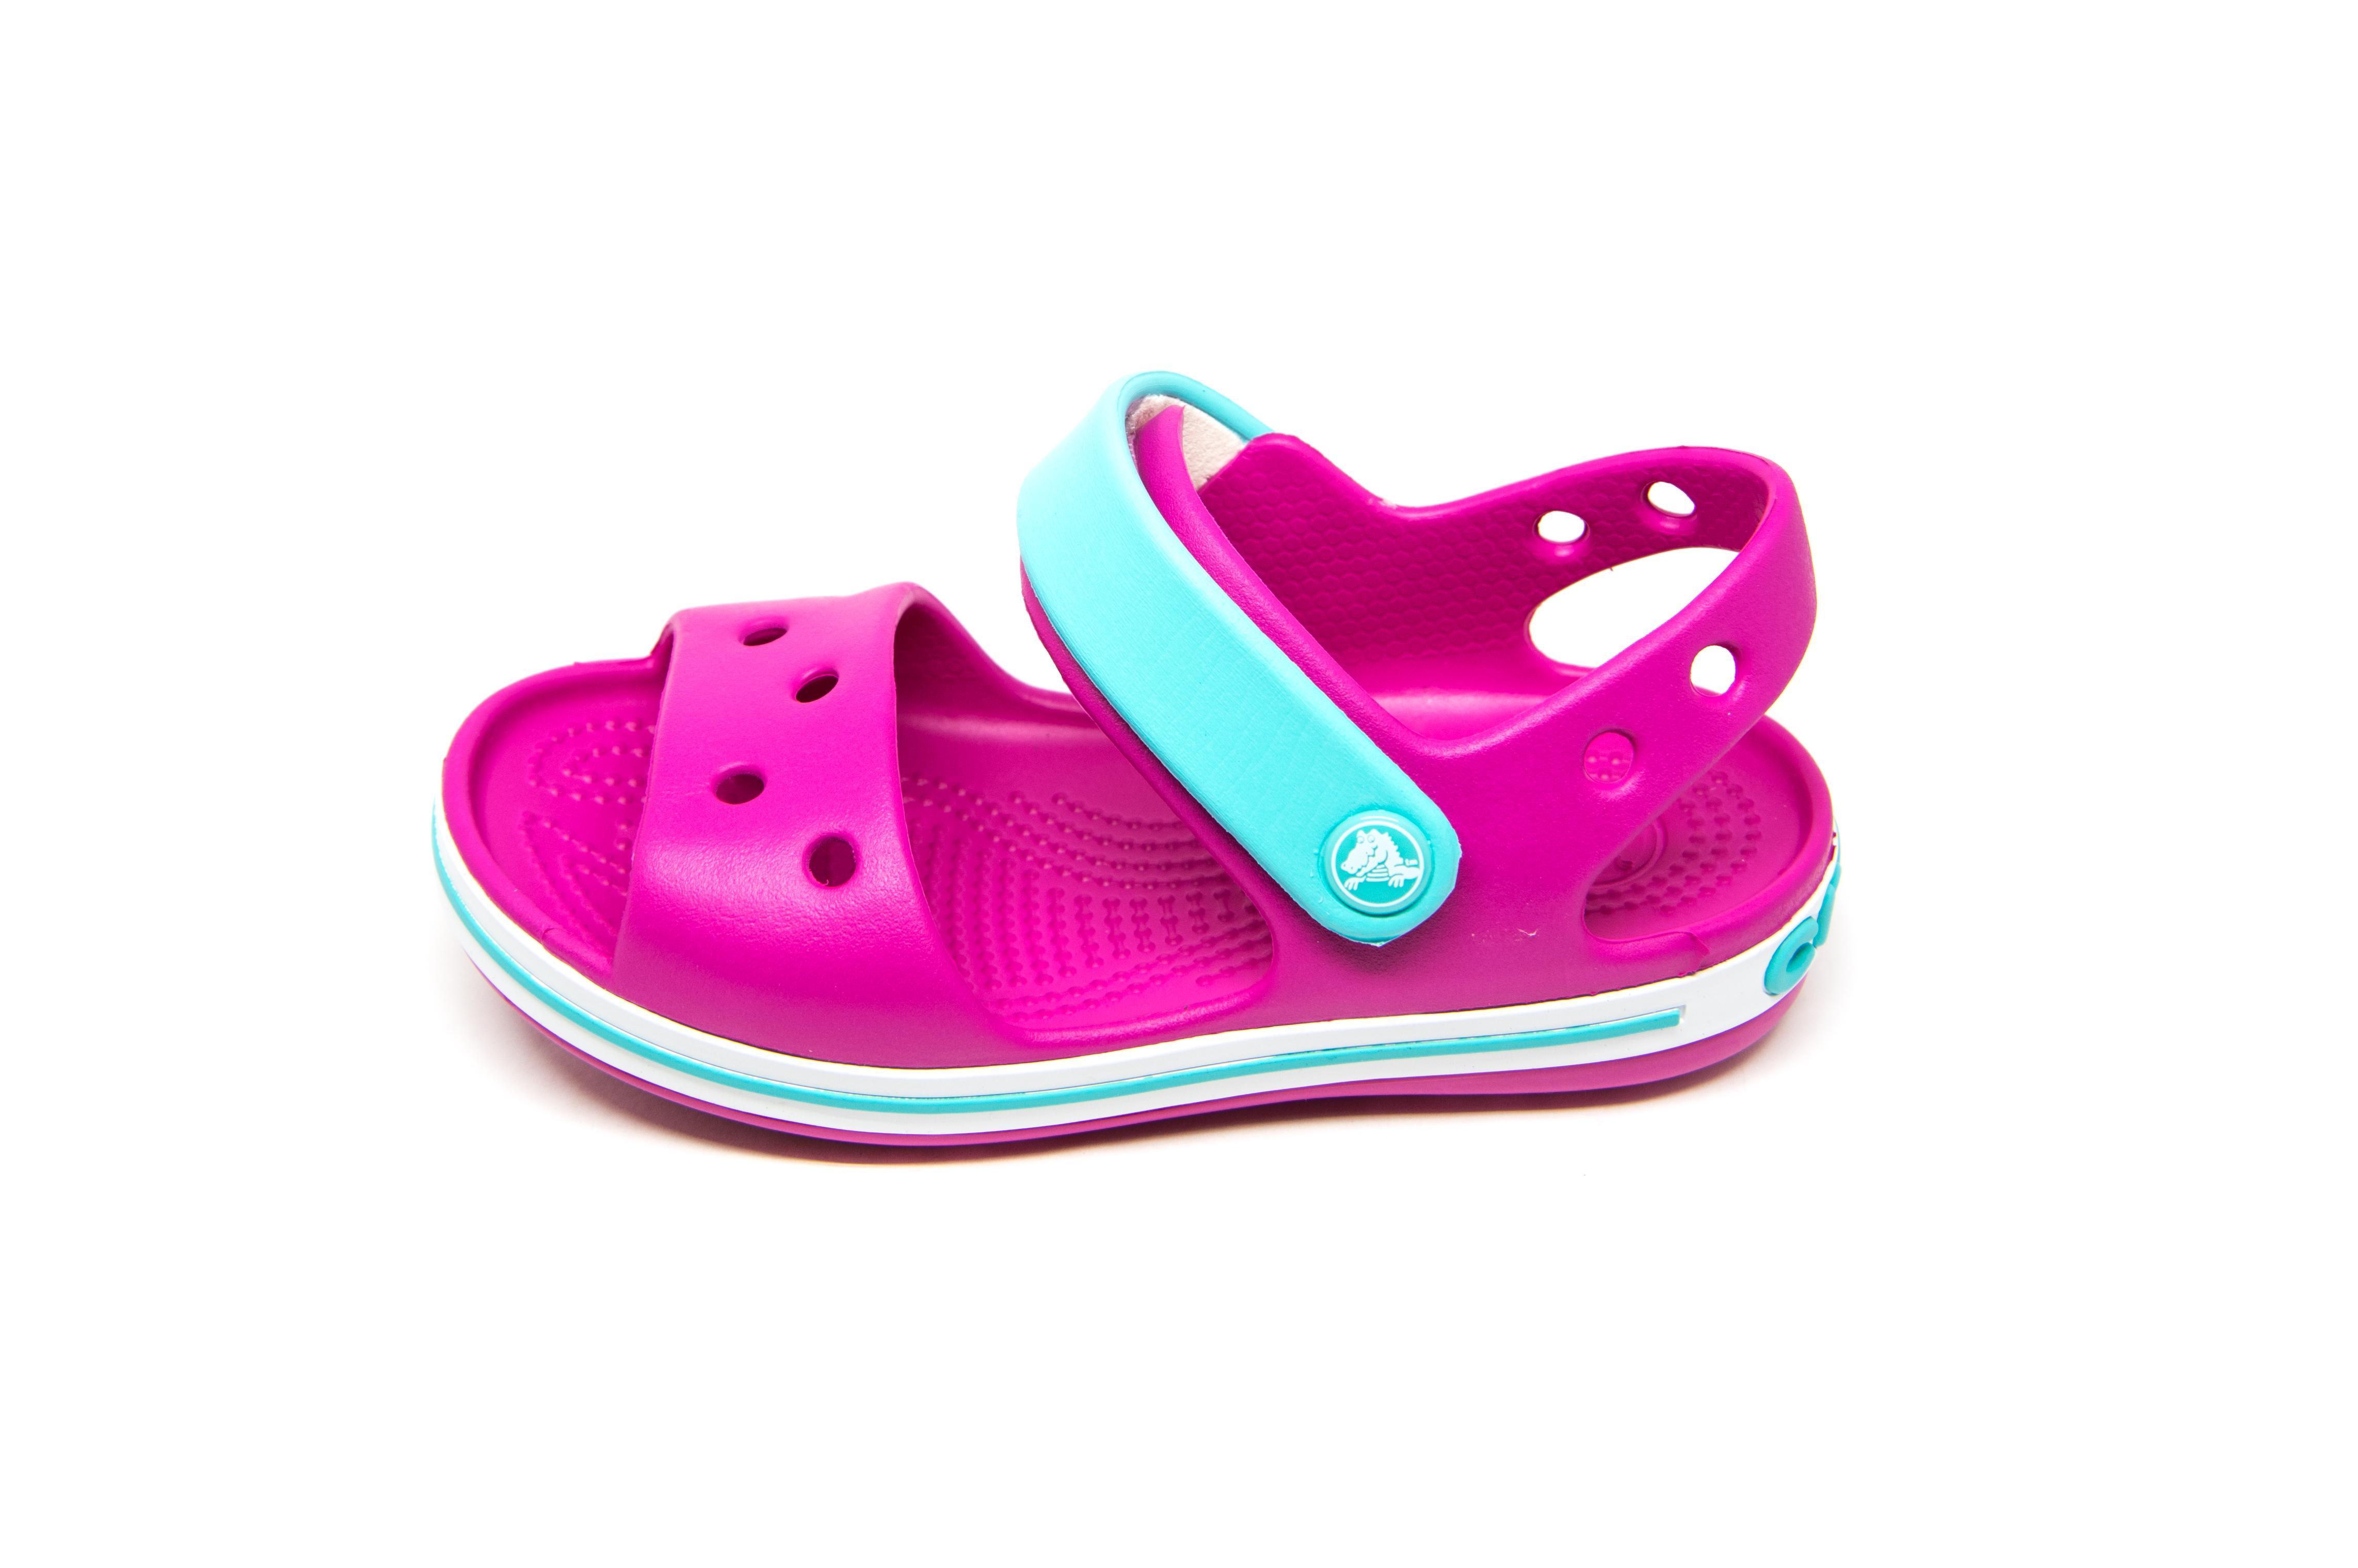 9ab6073f880 Crocs Crocband Sandal 12856-6LH φούξια | Patousaki Παιδικά Παπούτσια